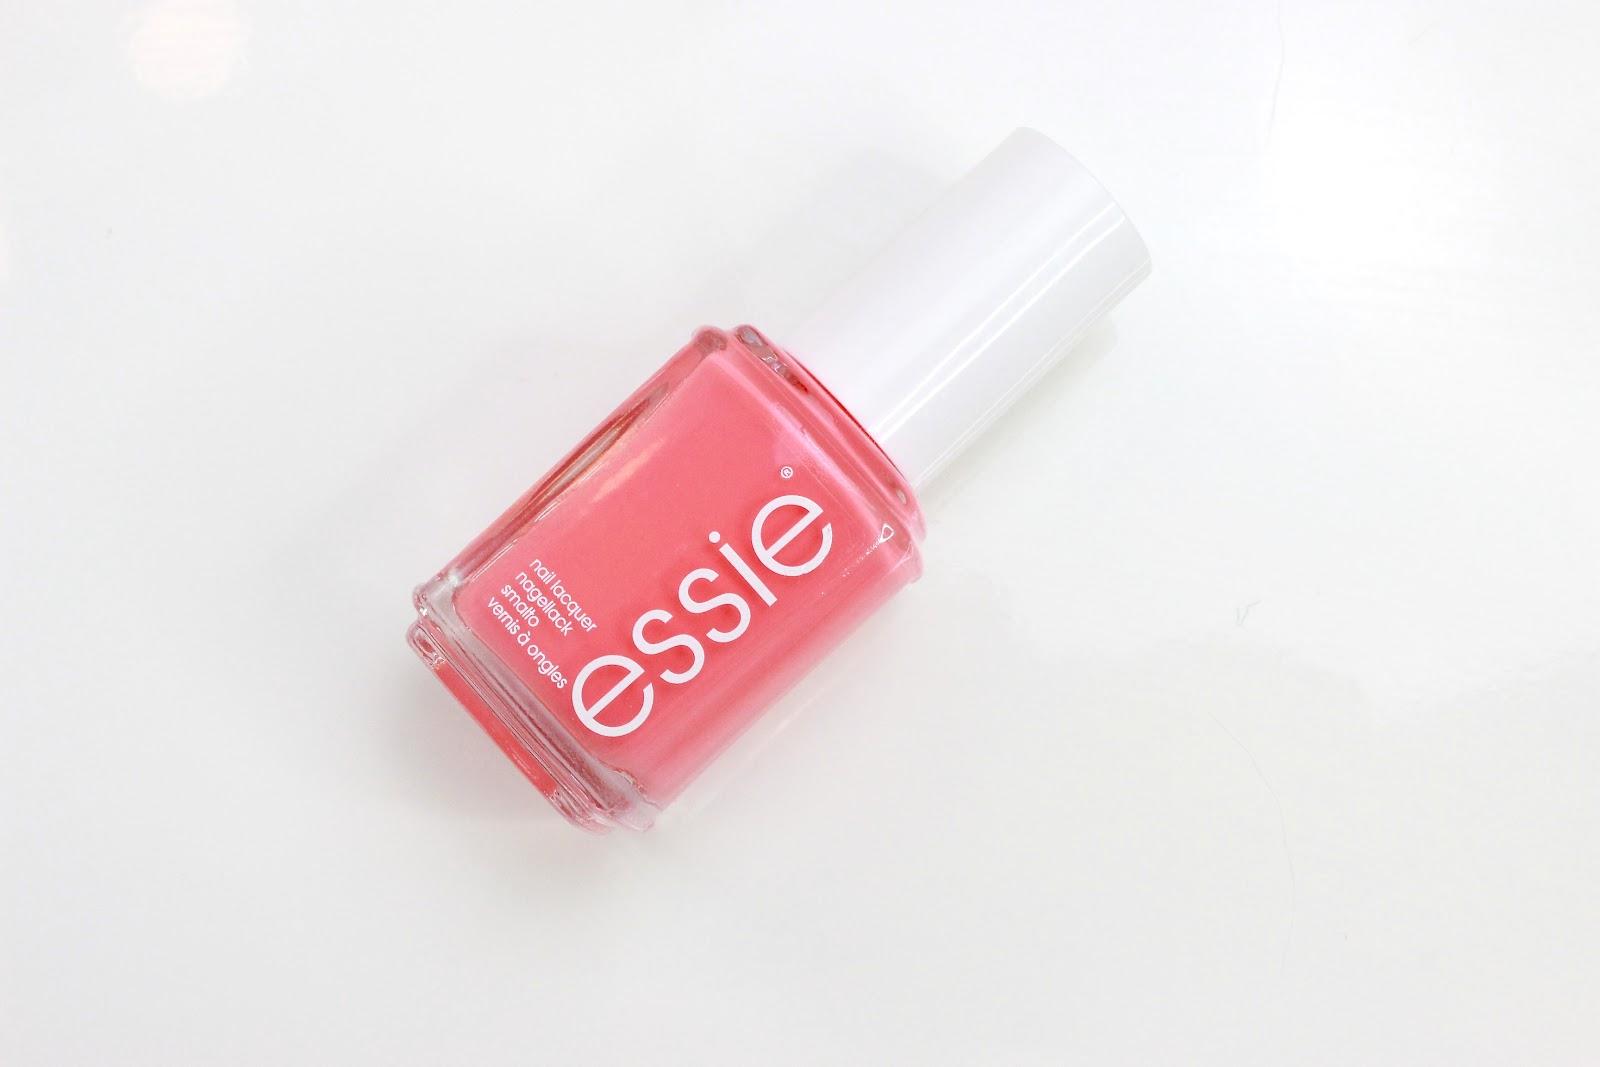 Essie Nail Polish in Tart Deco